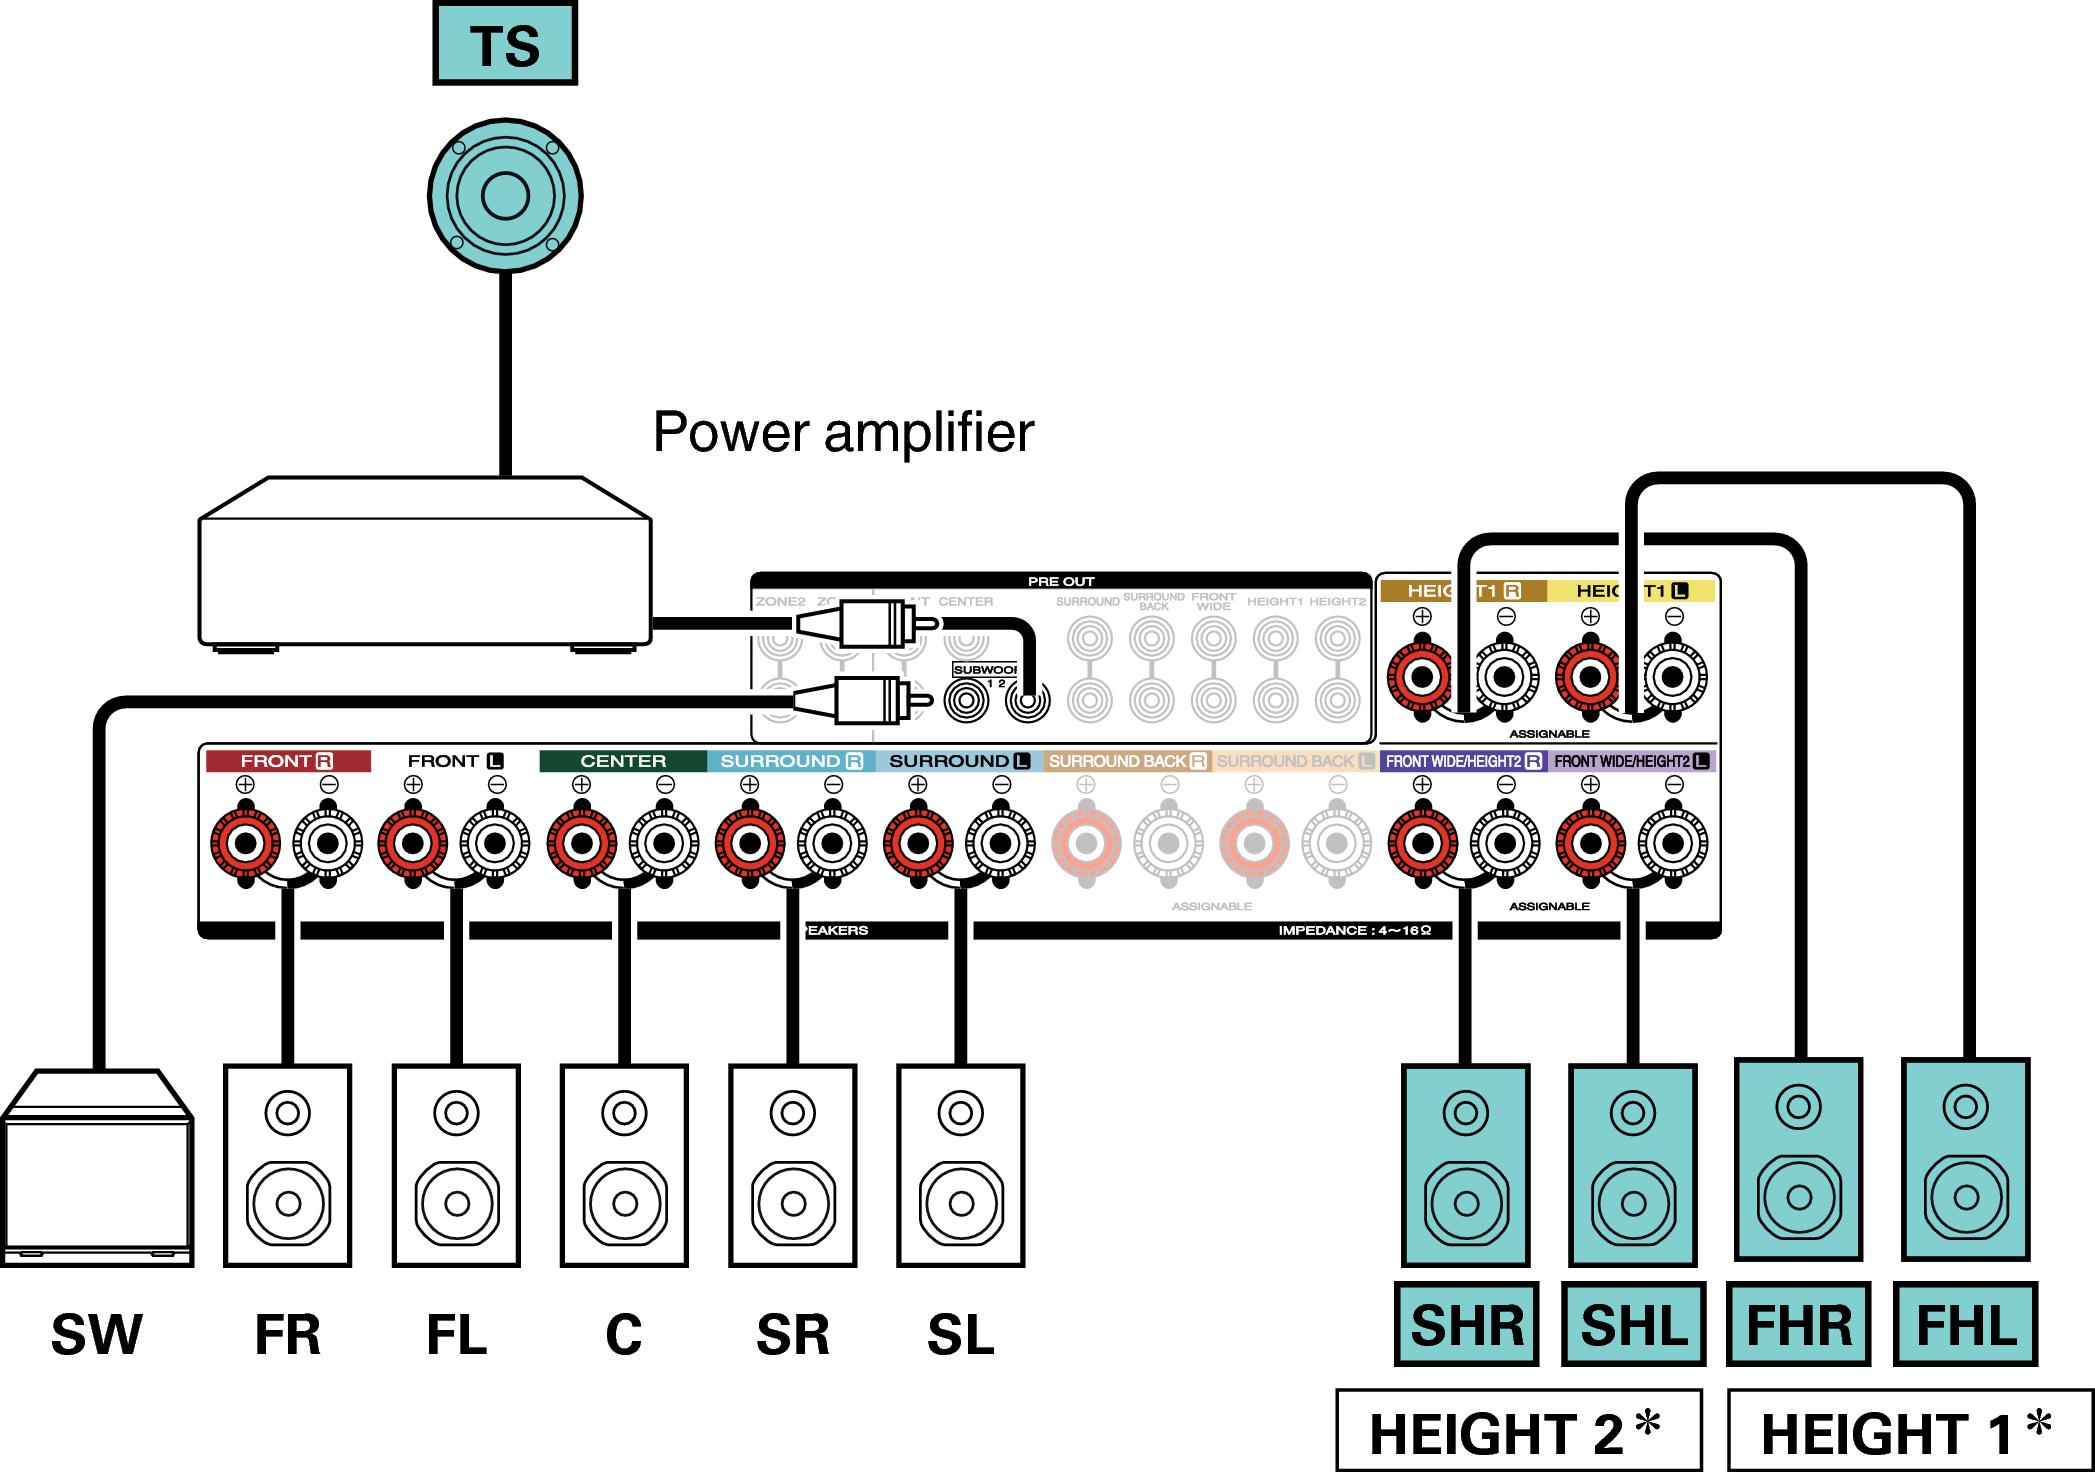 Speaker Configuration And Amp Assign Settings Sr7010 Diagram Besides Pa System Setup In Addition Basic Conne Sp 101 Auro3d 7010u